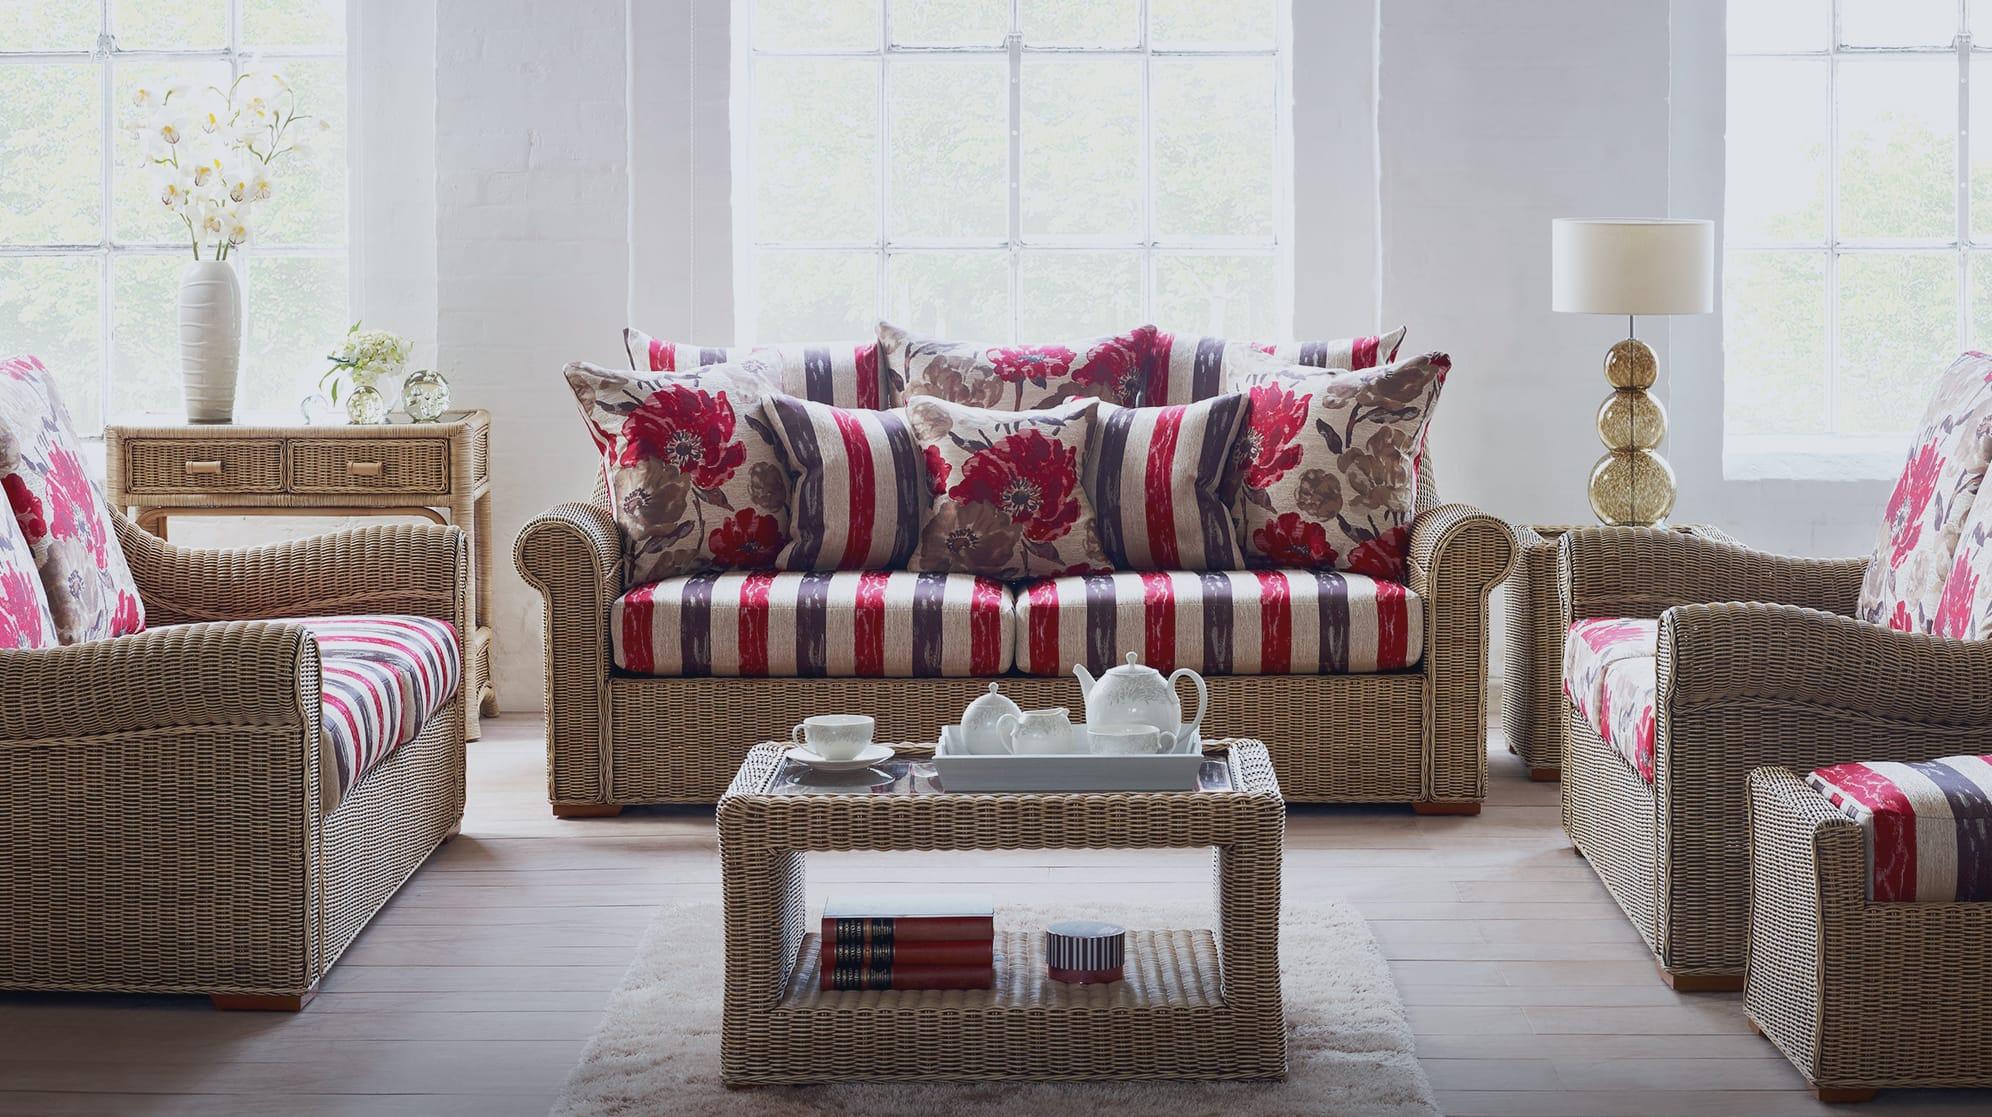 cane furniture Swindon